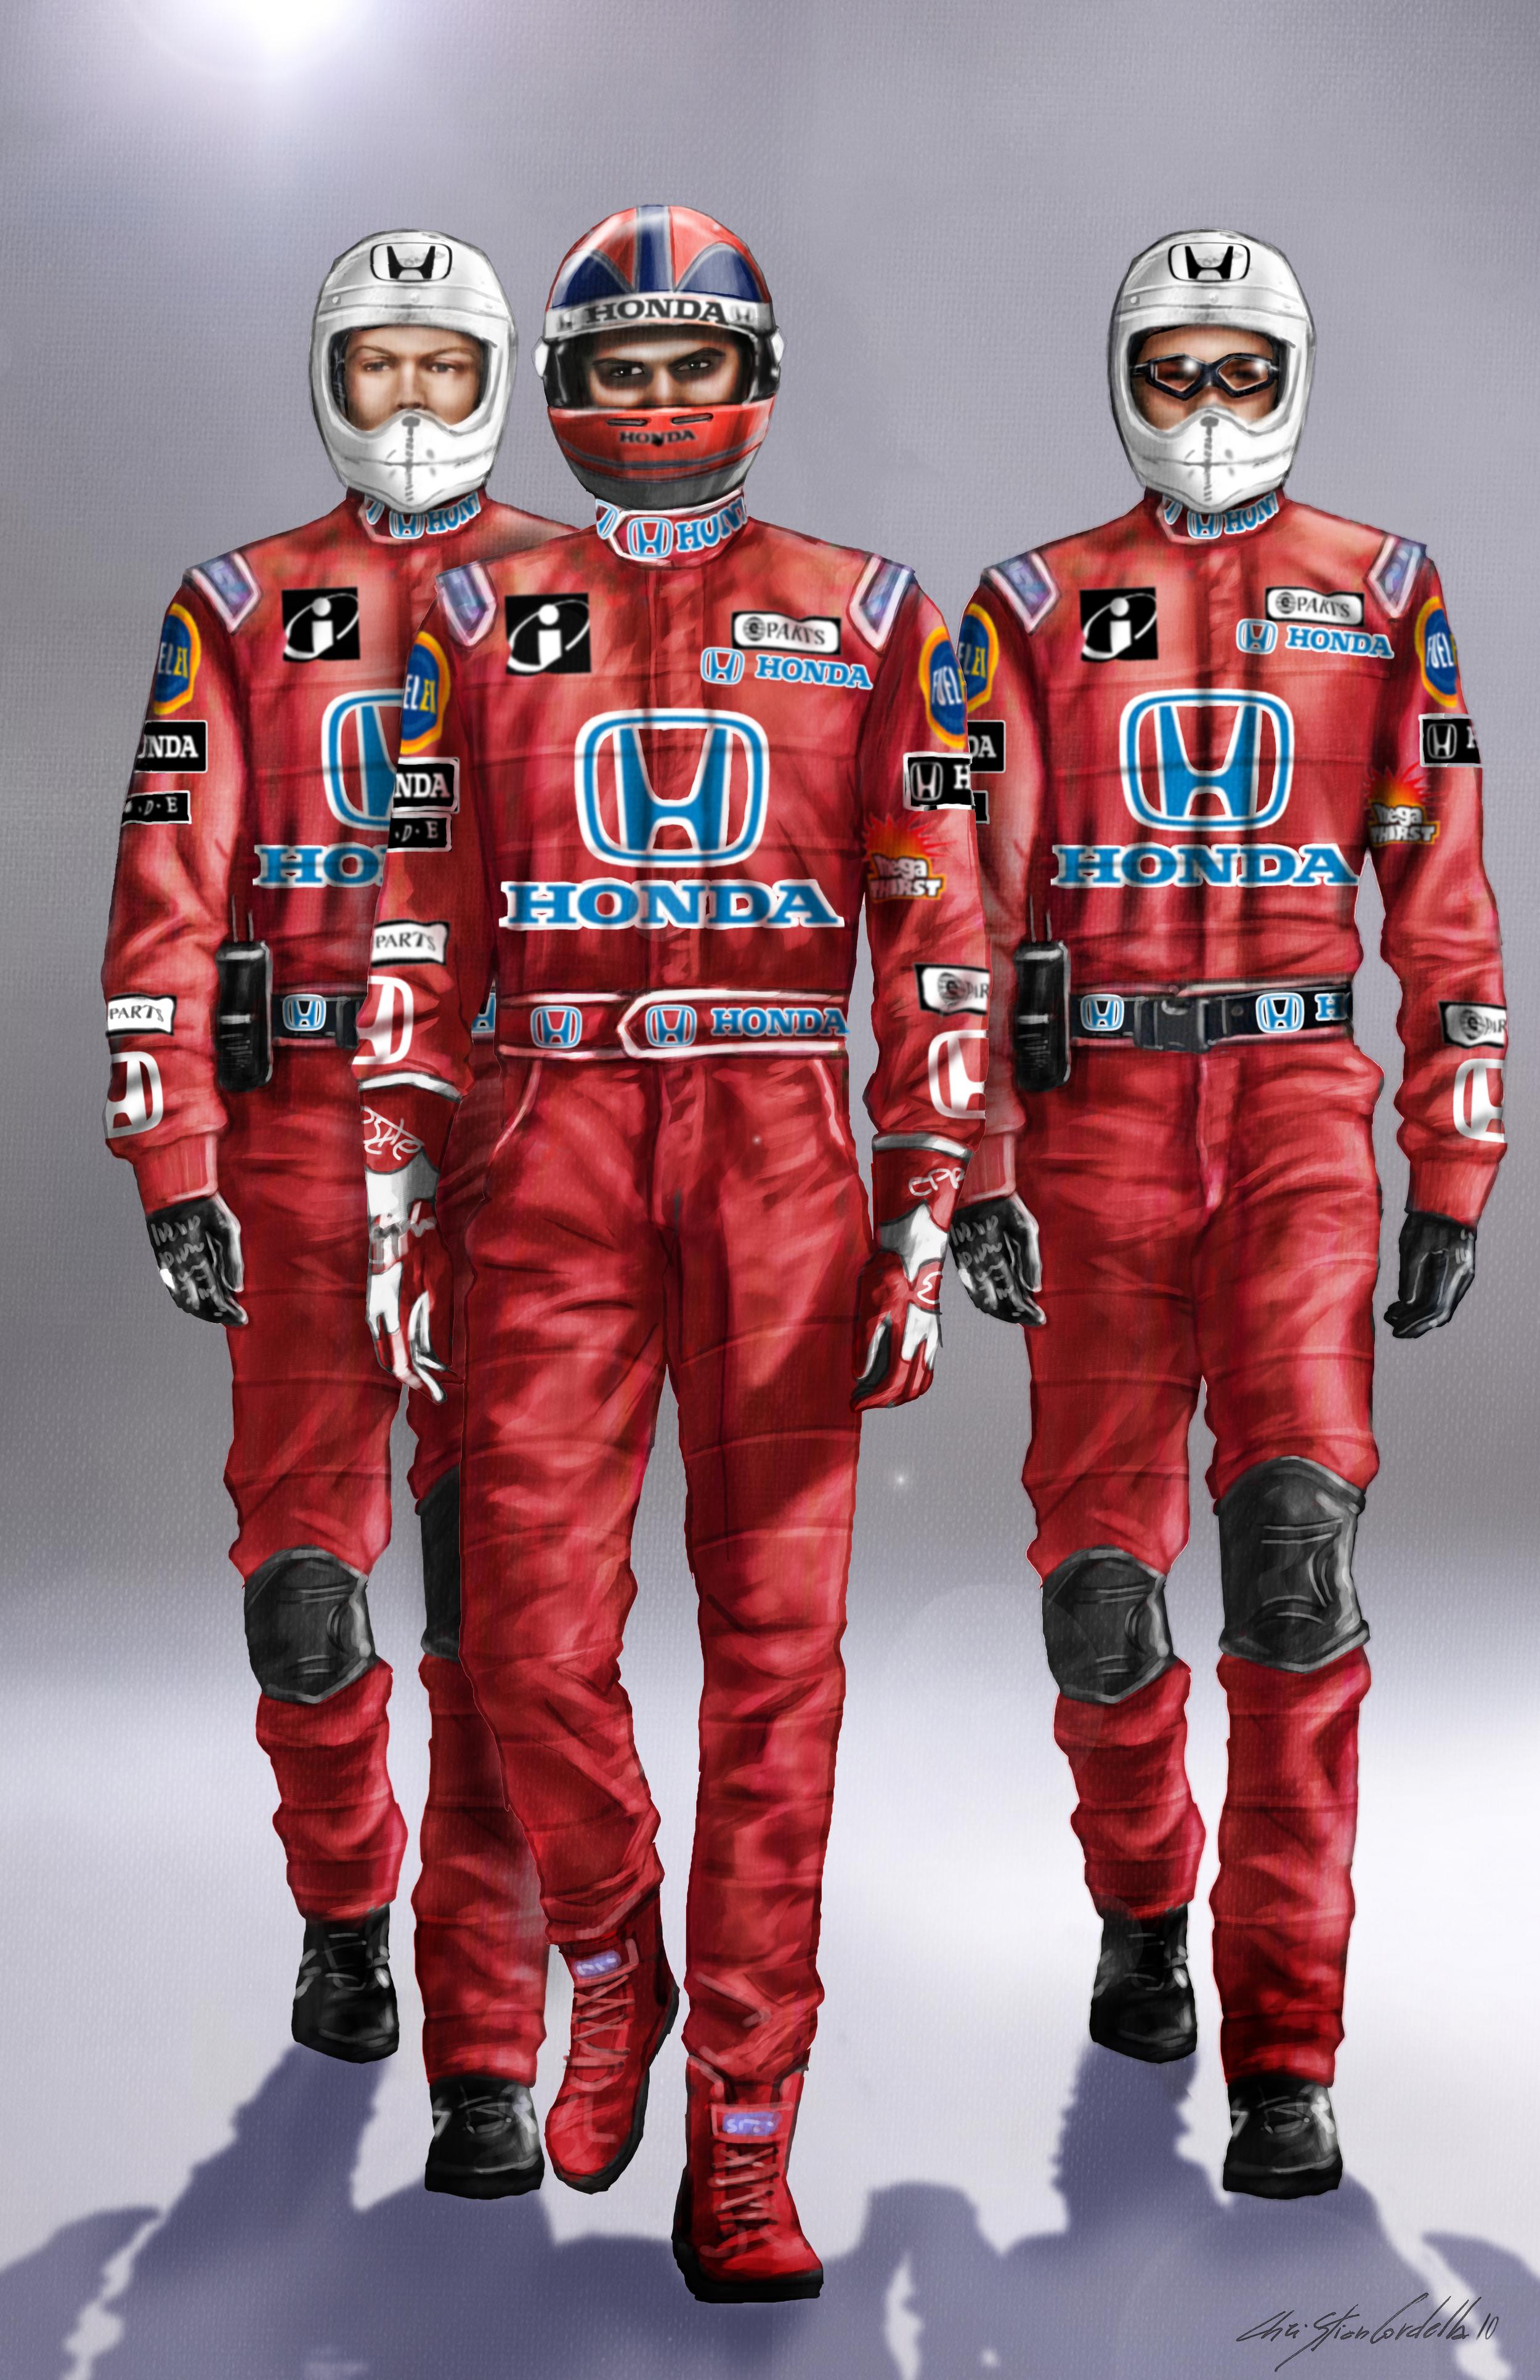 HONDA-RACERS-DOLAN.jpg